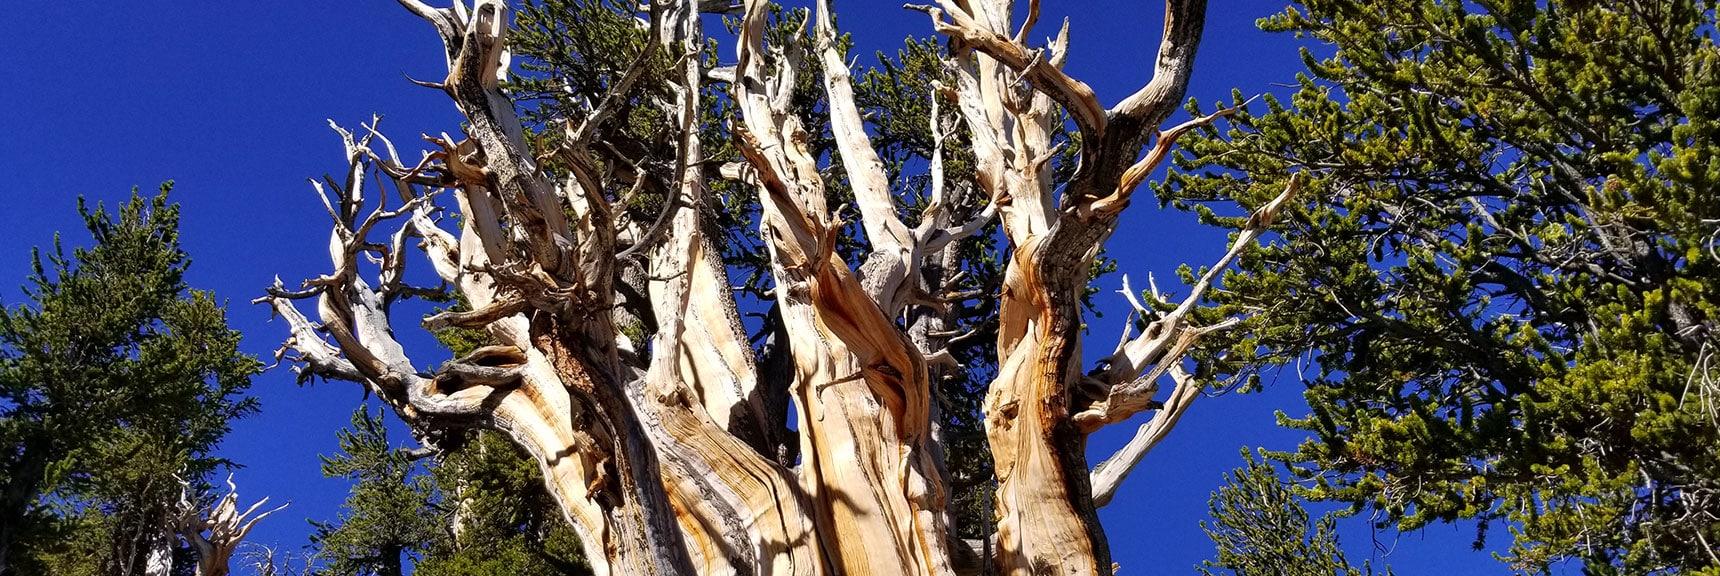 Huge Bristlecone Pine Just Below South Rim of Kyle Canyon